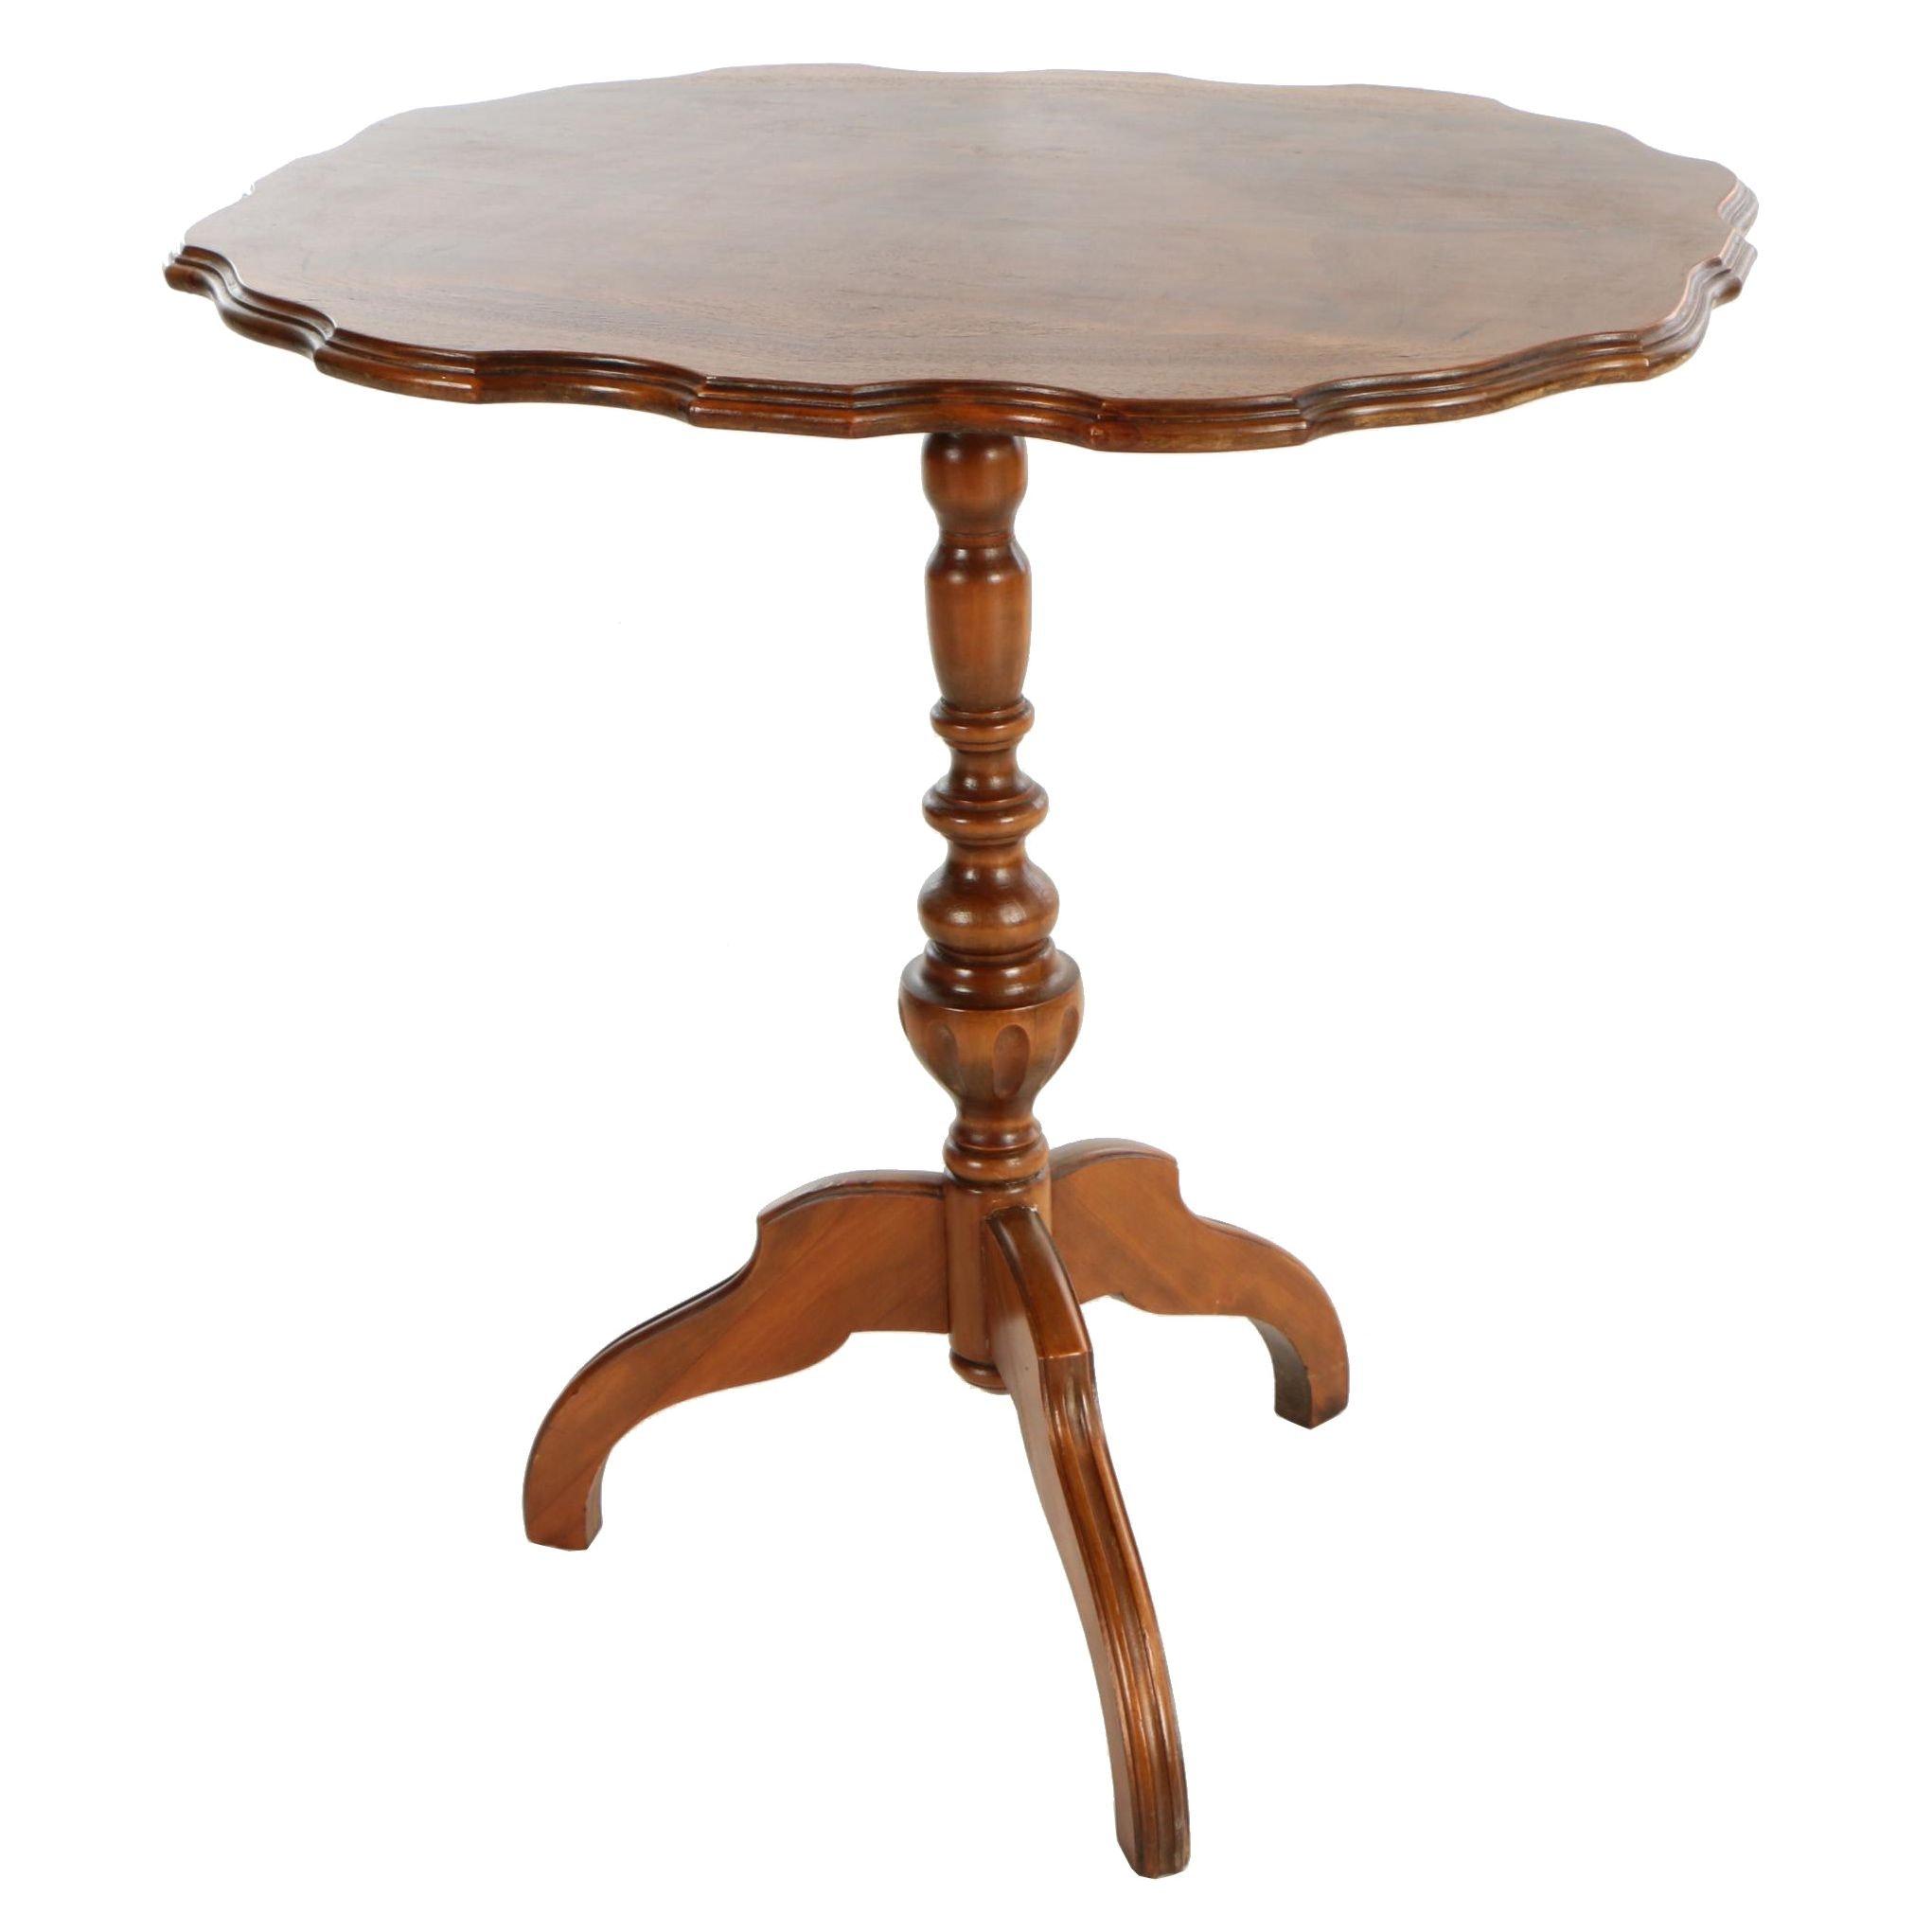 Mahogany Tilt-Top Side Table, 20th Century